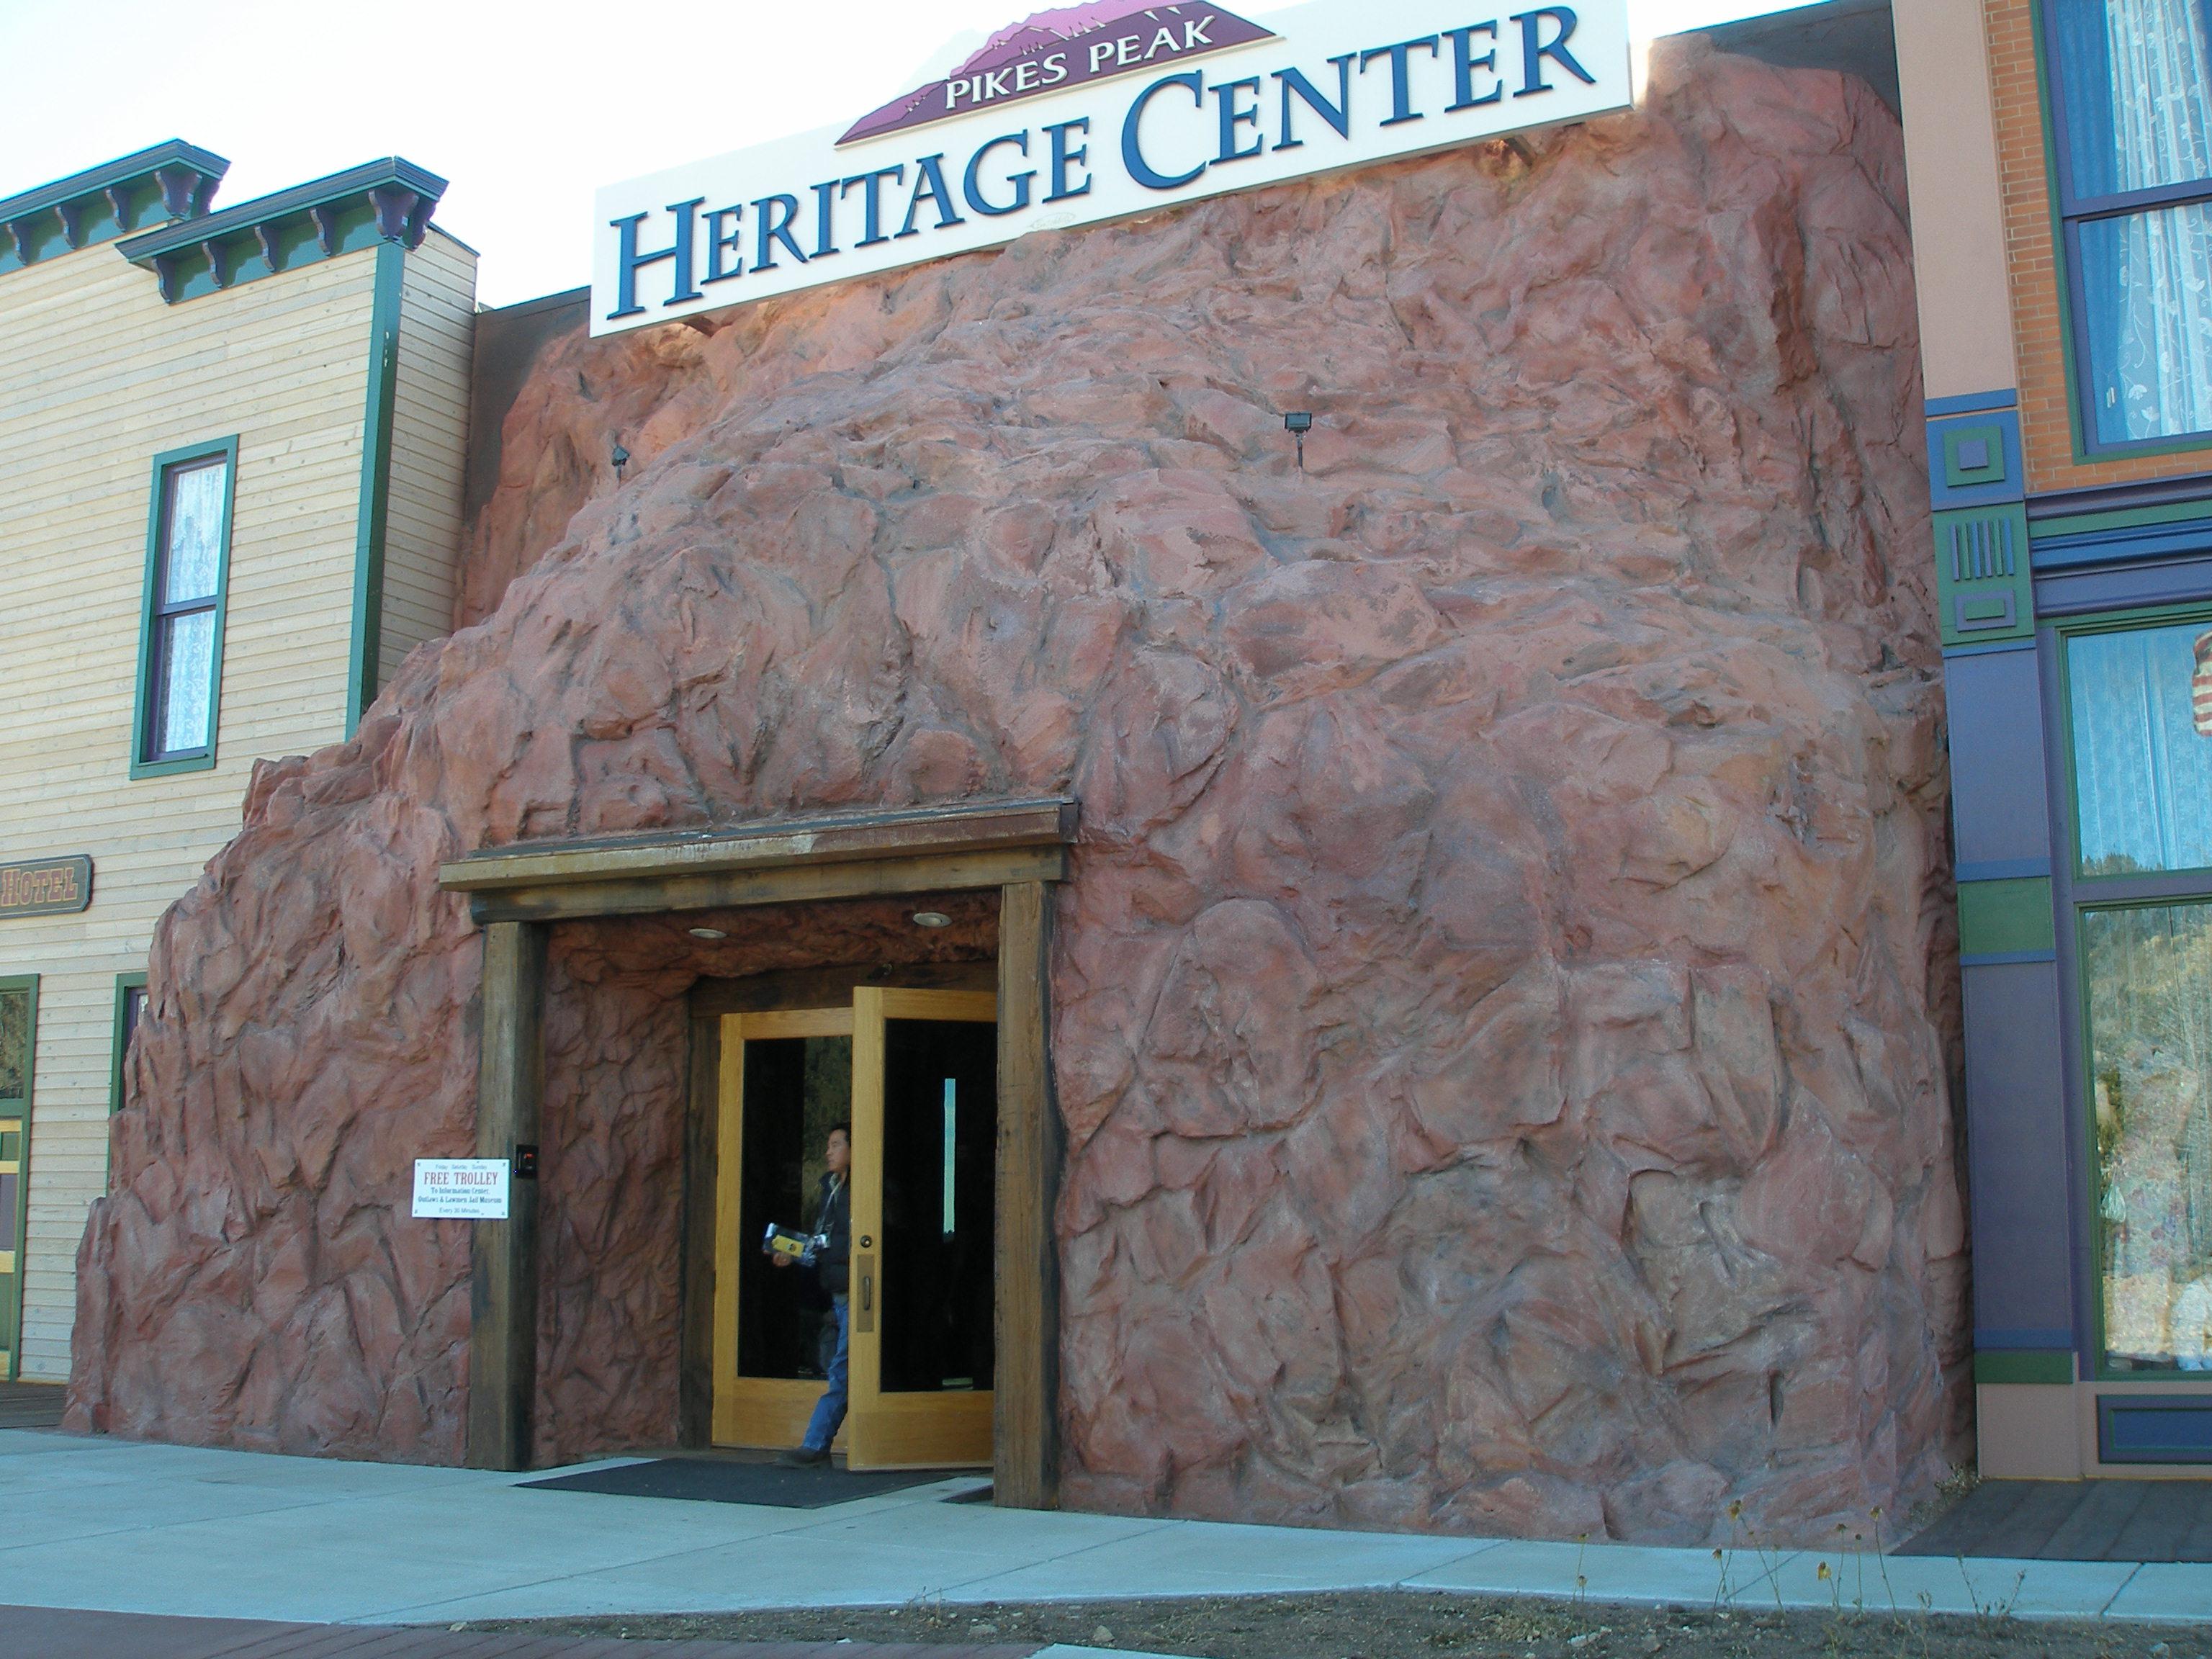 Pikes Peak Heritage Center detail image